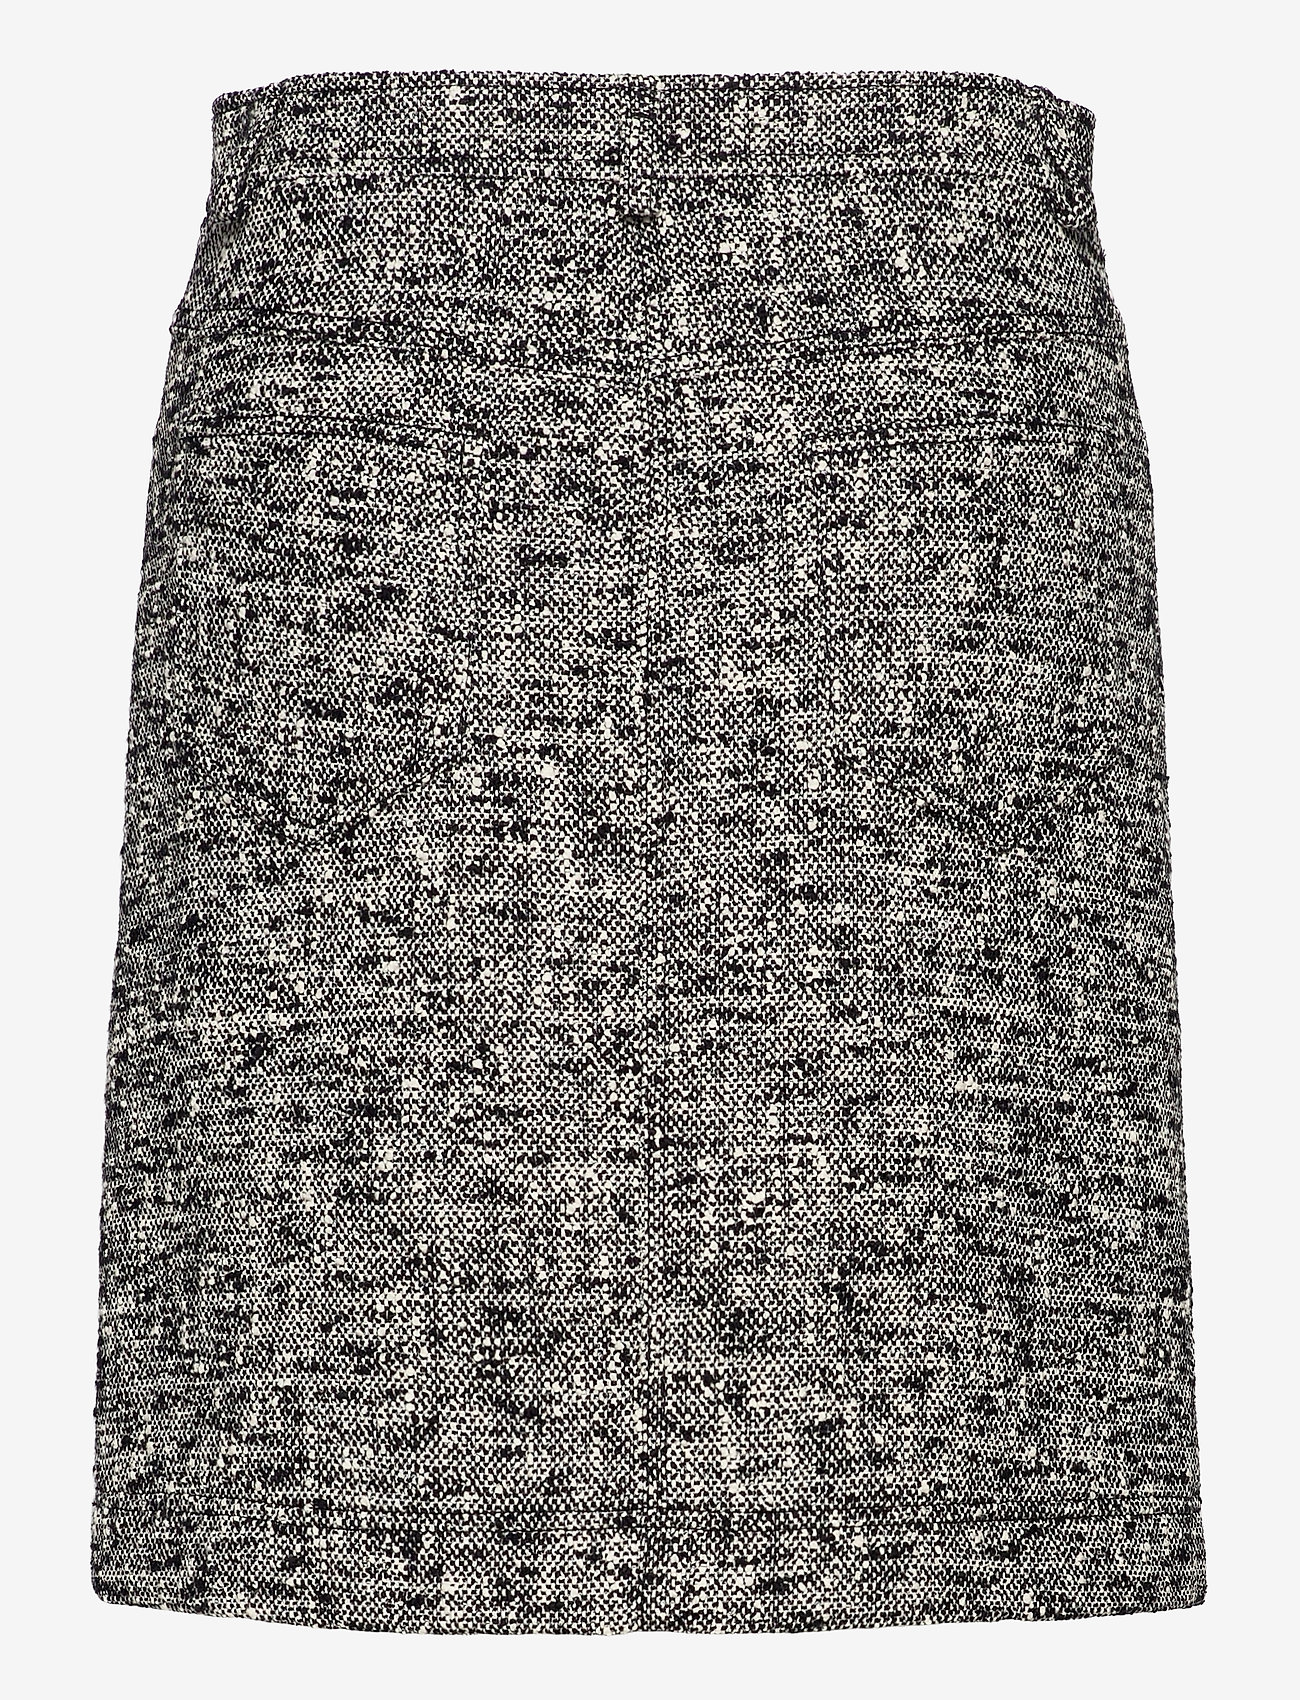 Boutique Moschino - Boutique Moschino SKIRT - midinederdele - black fantasy print - 1